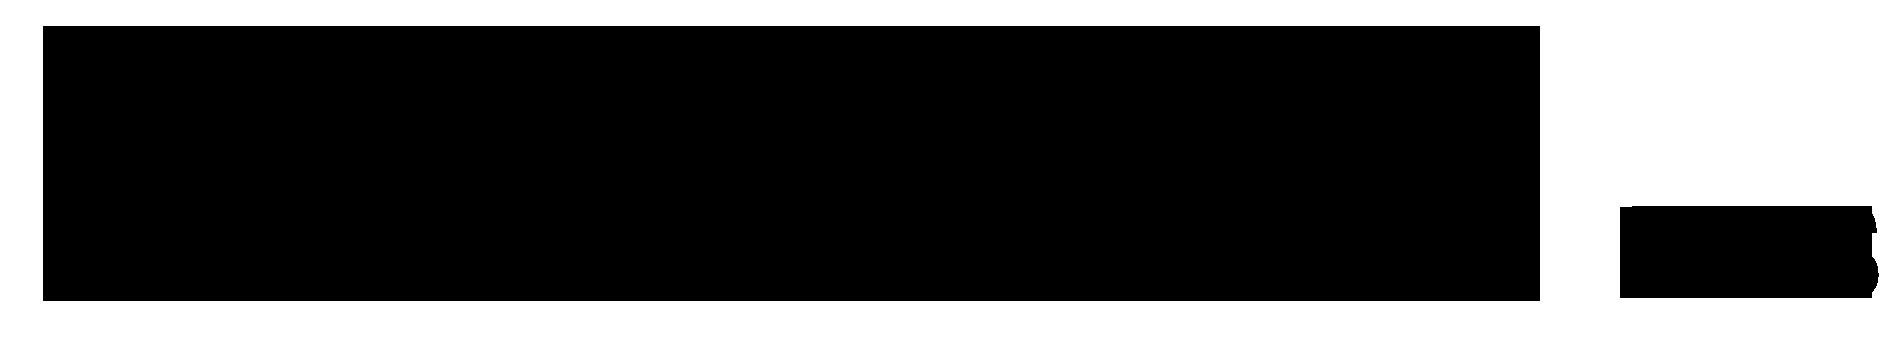 Ray Young Frics Logo